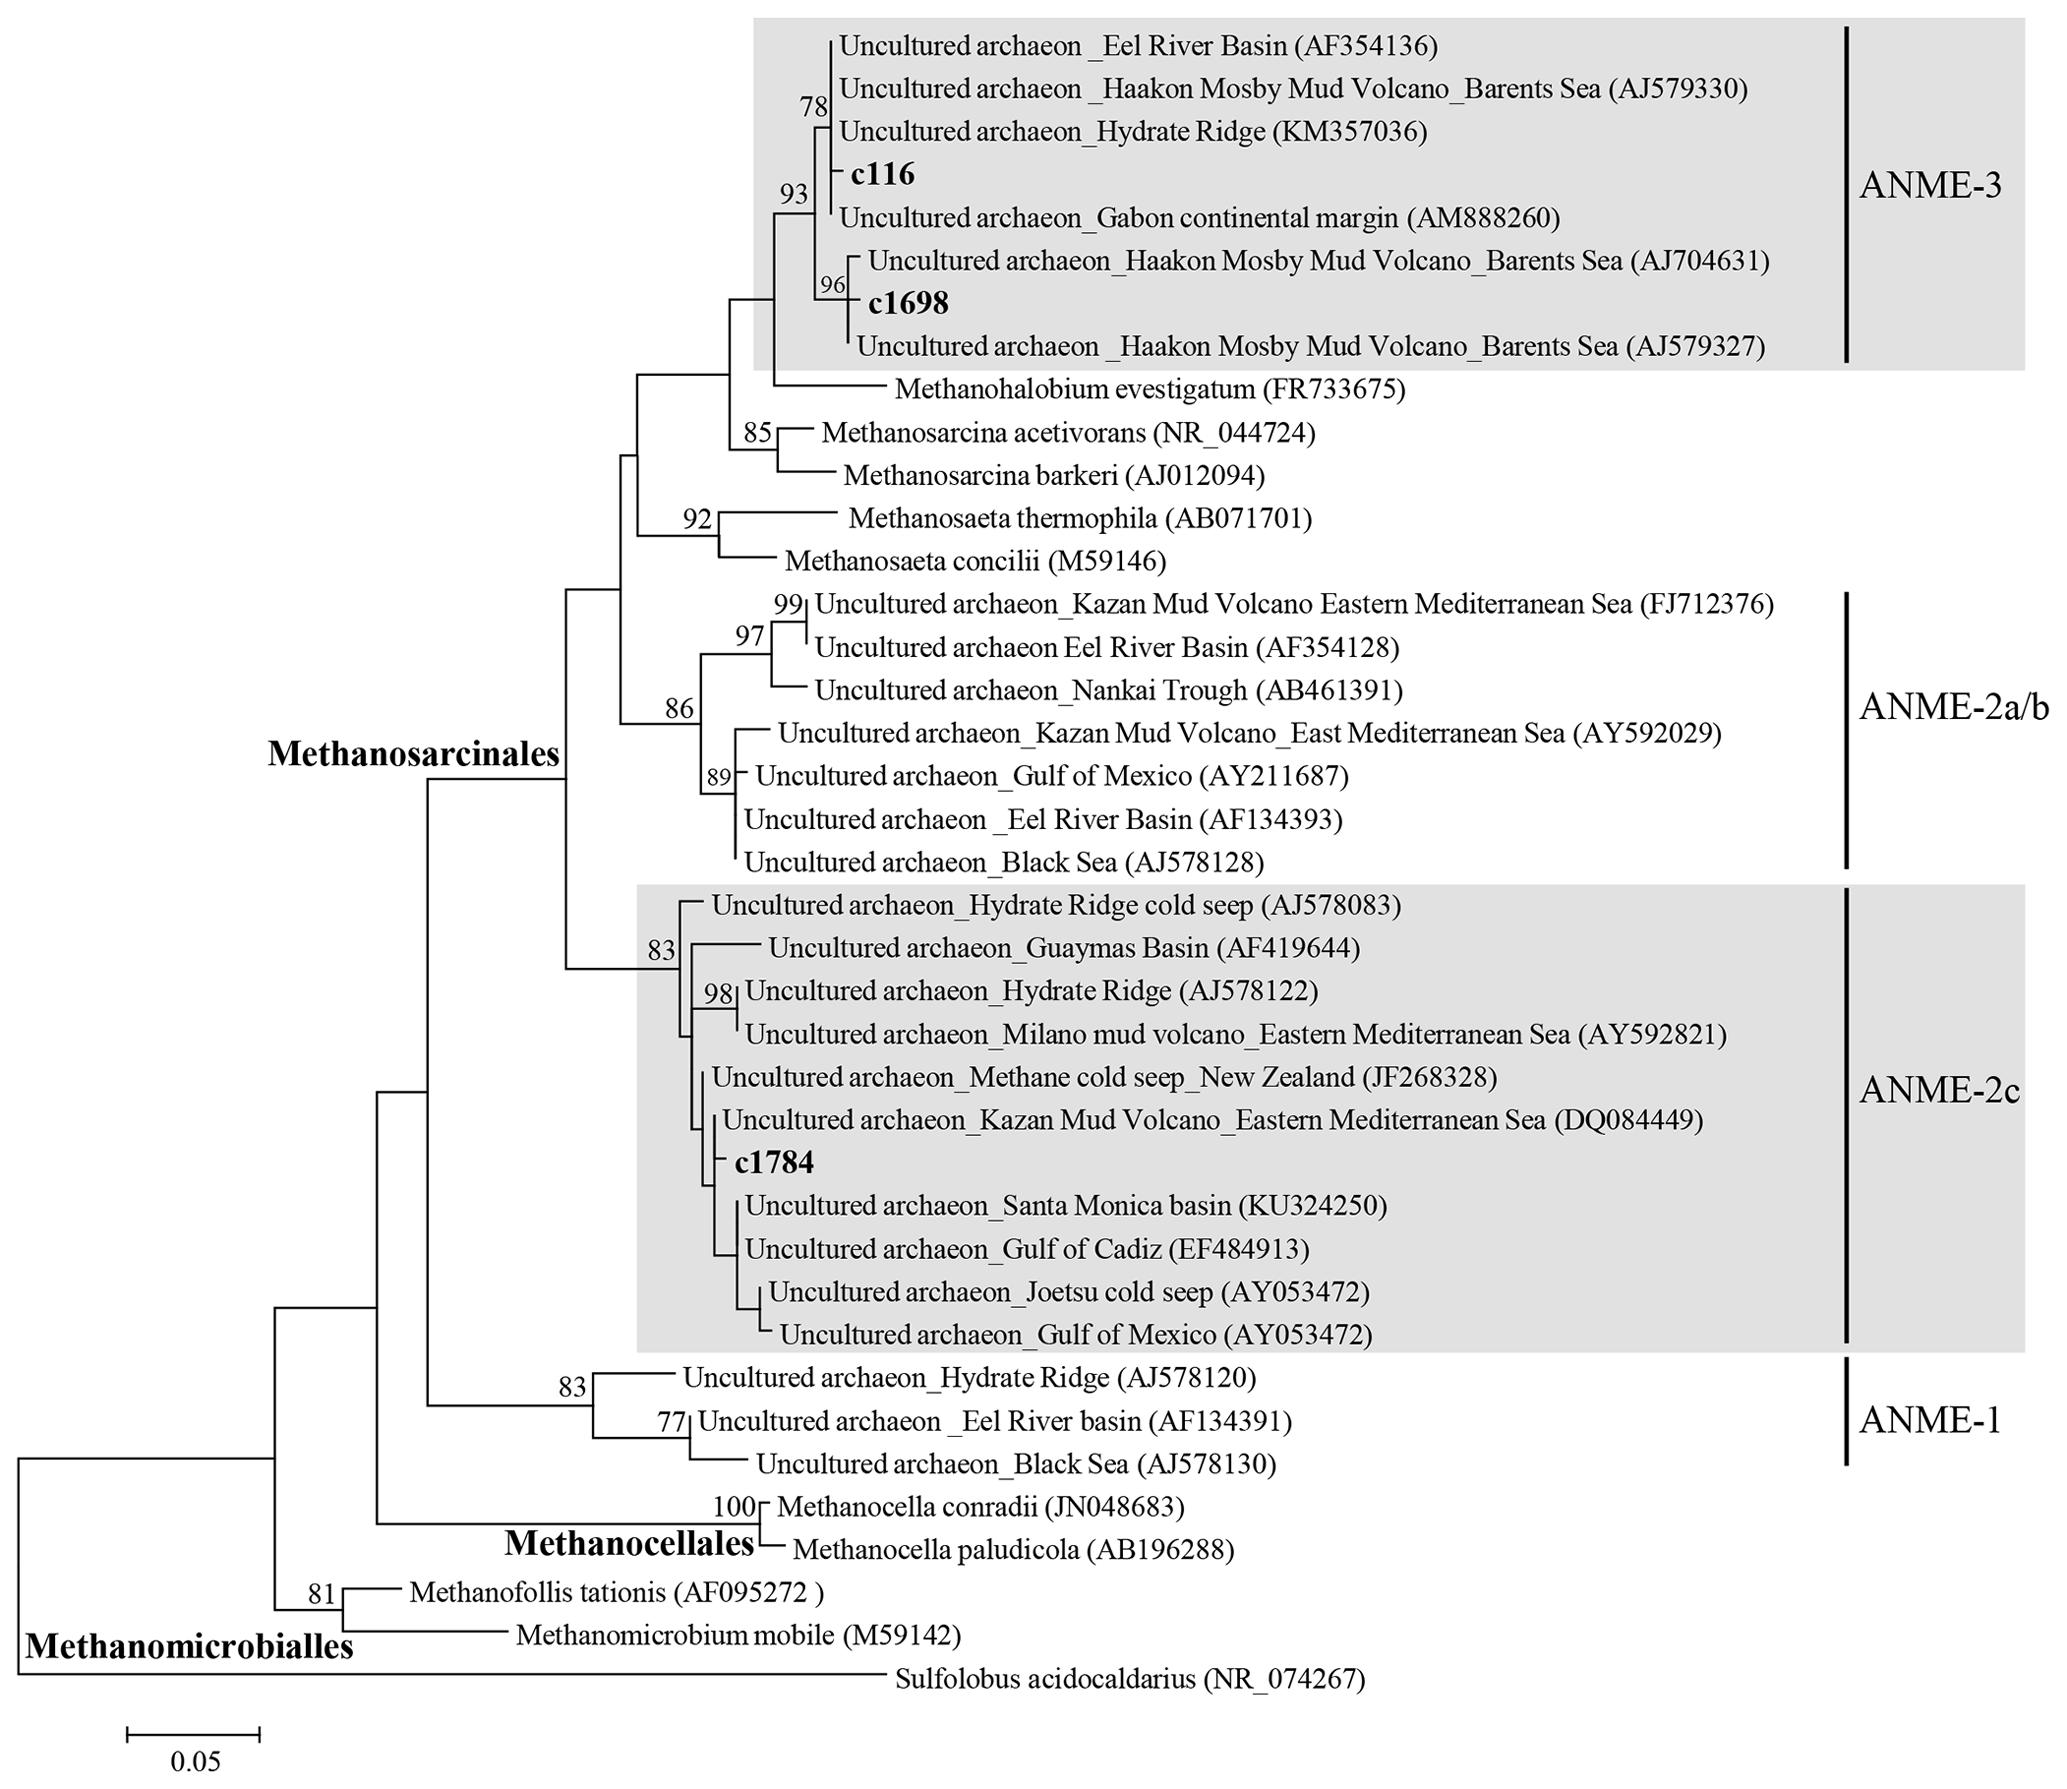 BG - Biogeochemical evidence of anaerobic methane oxidation